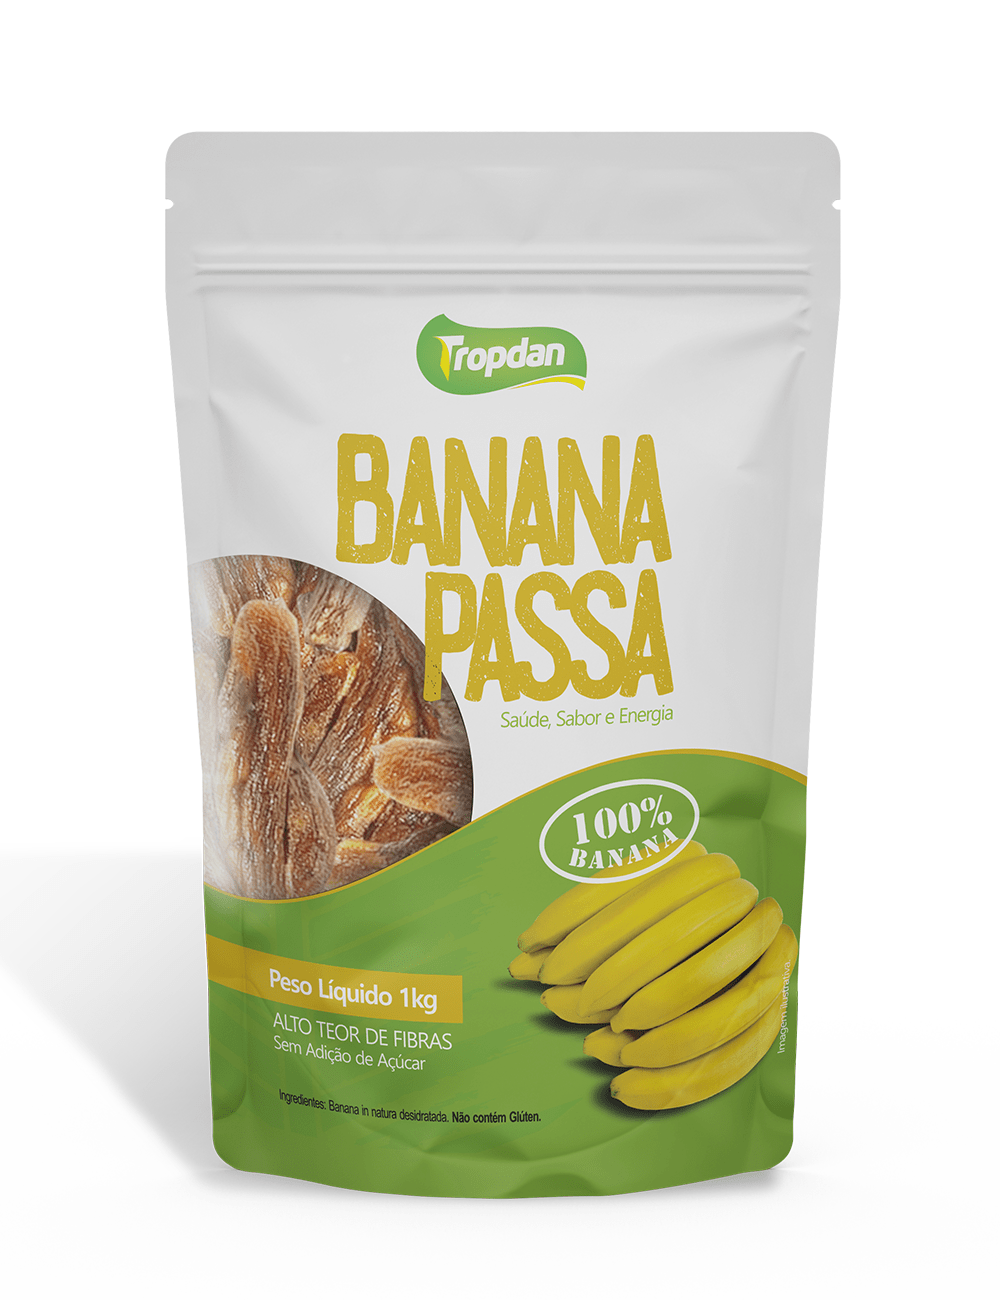 Banana Passa Pacote 1KG